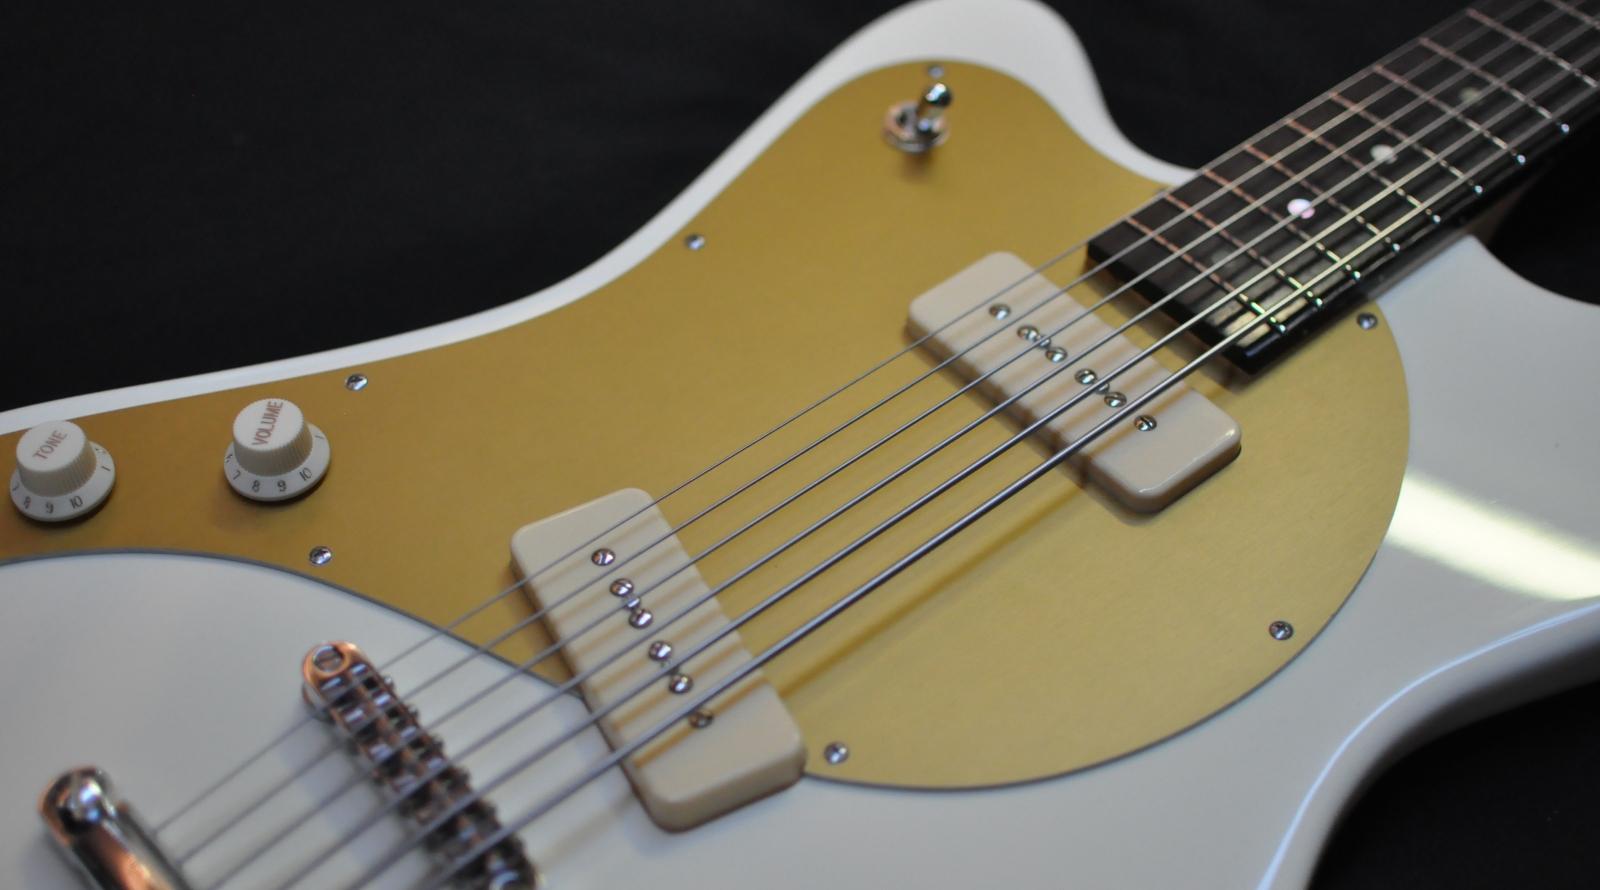 1403 - Giles Bass VI (Lowtide)